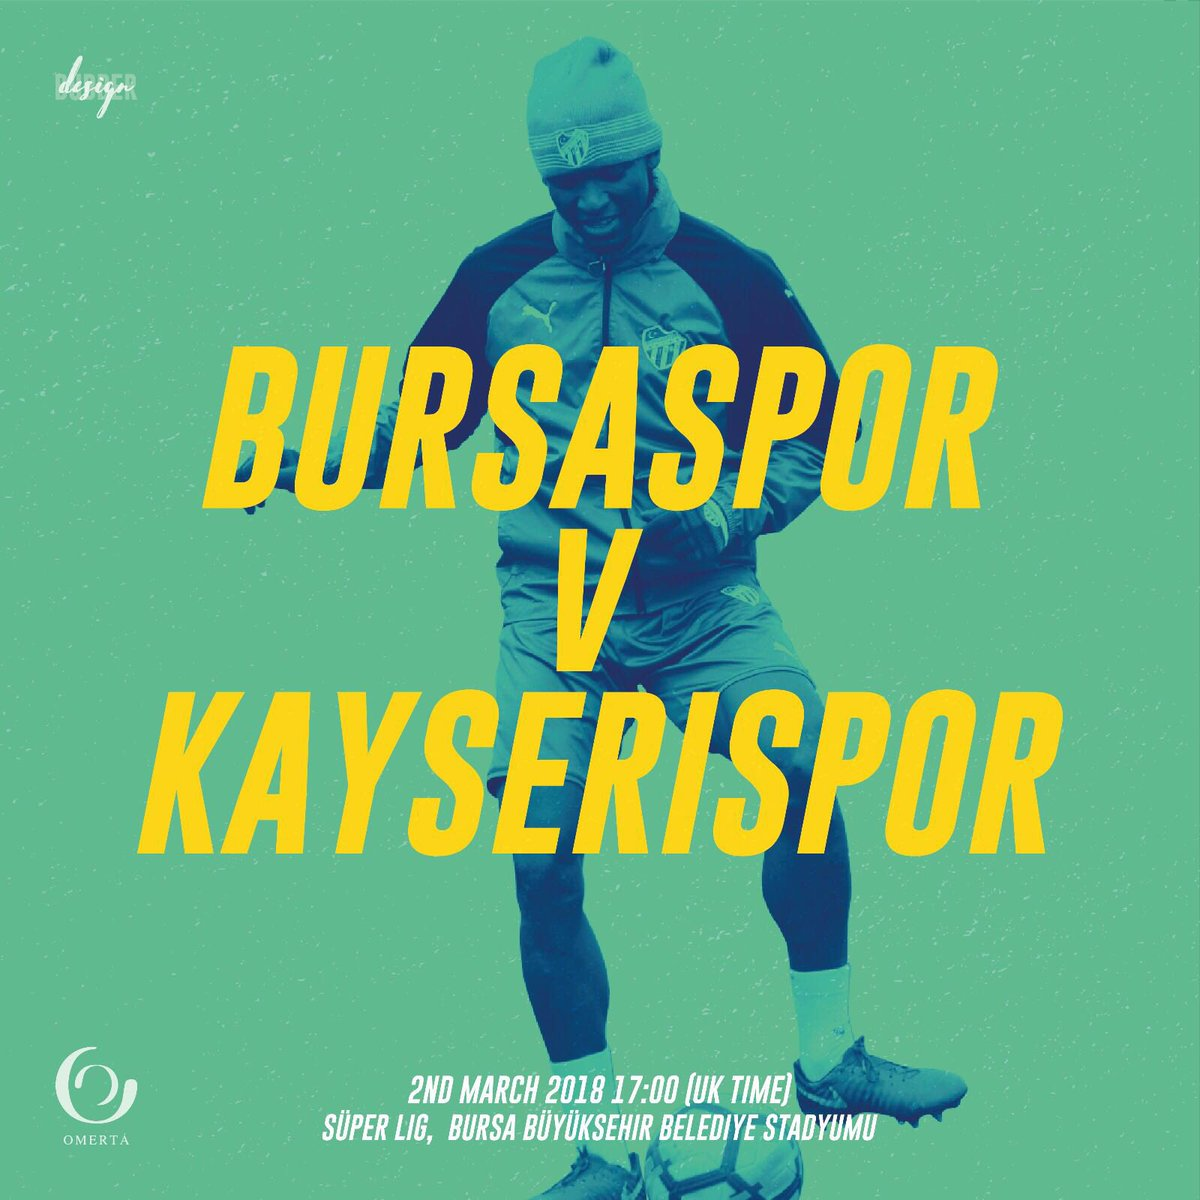 Match Day! 🐊 @BursasporSk